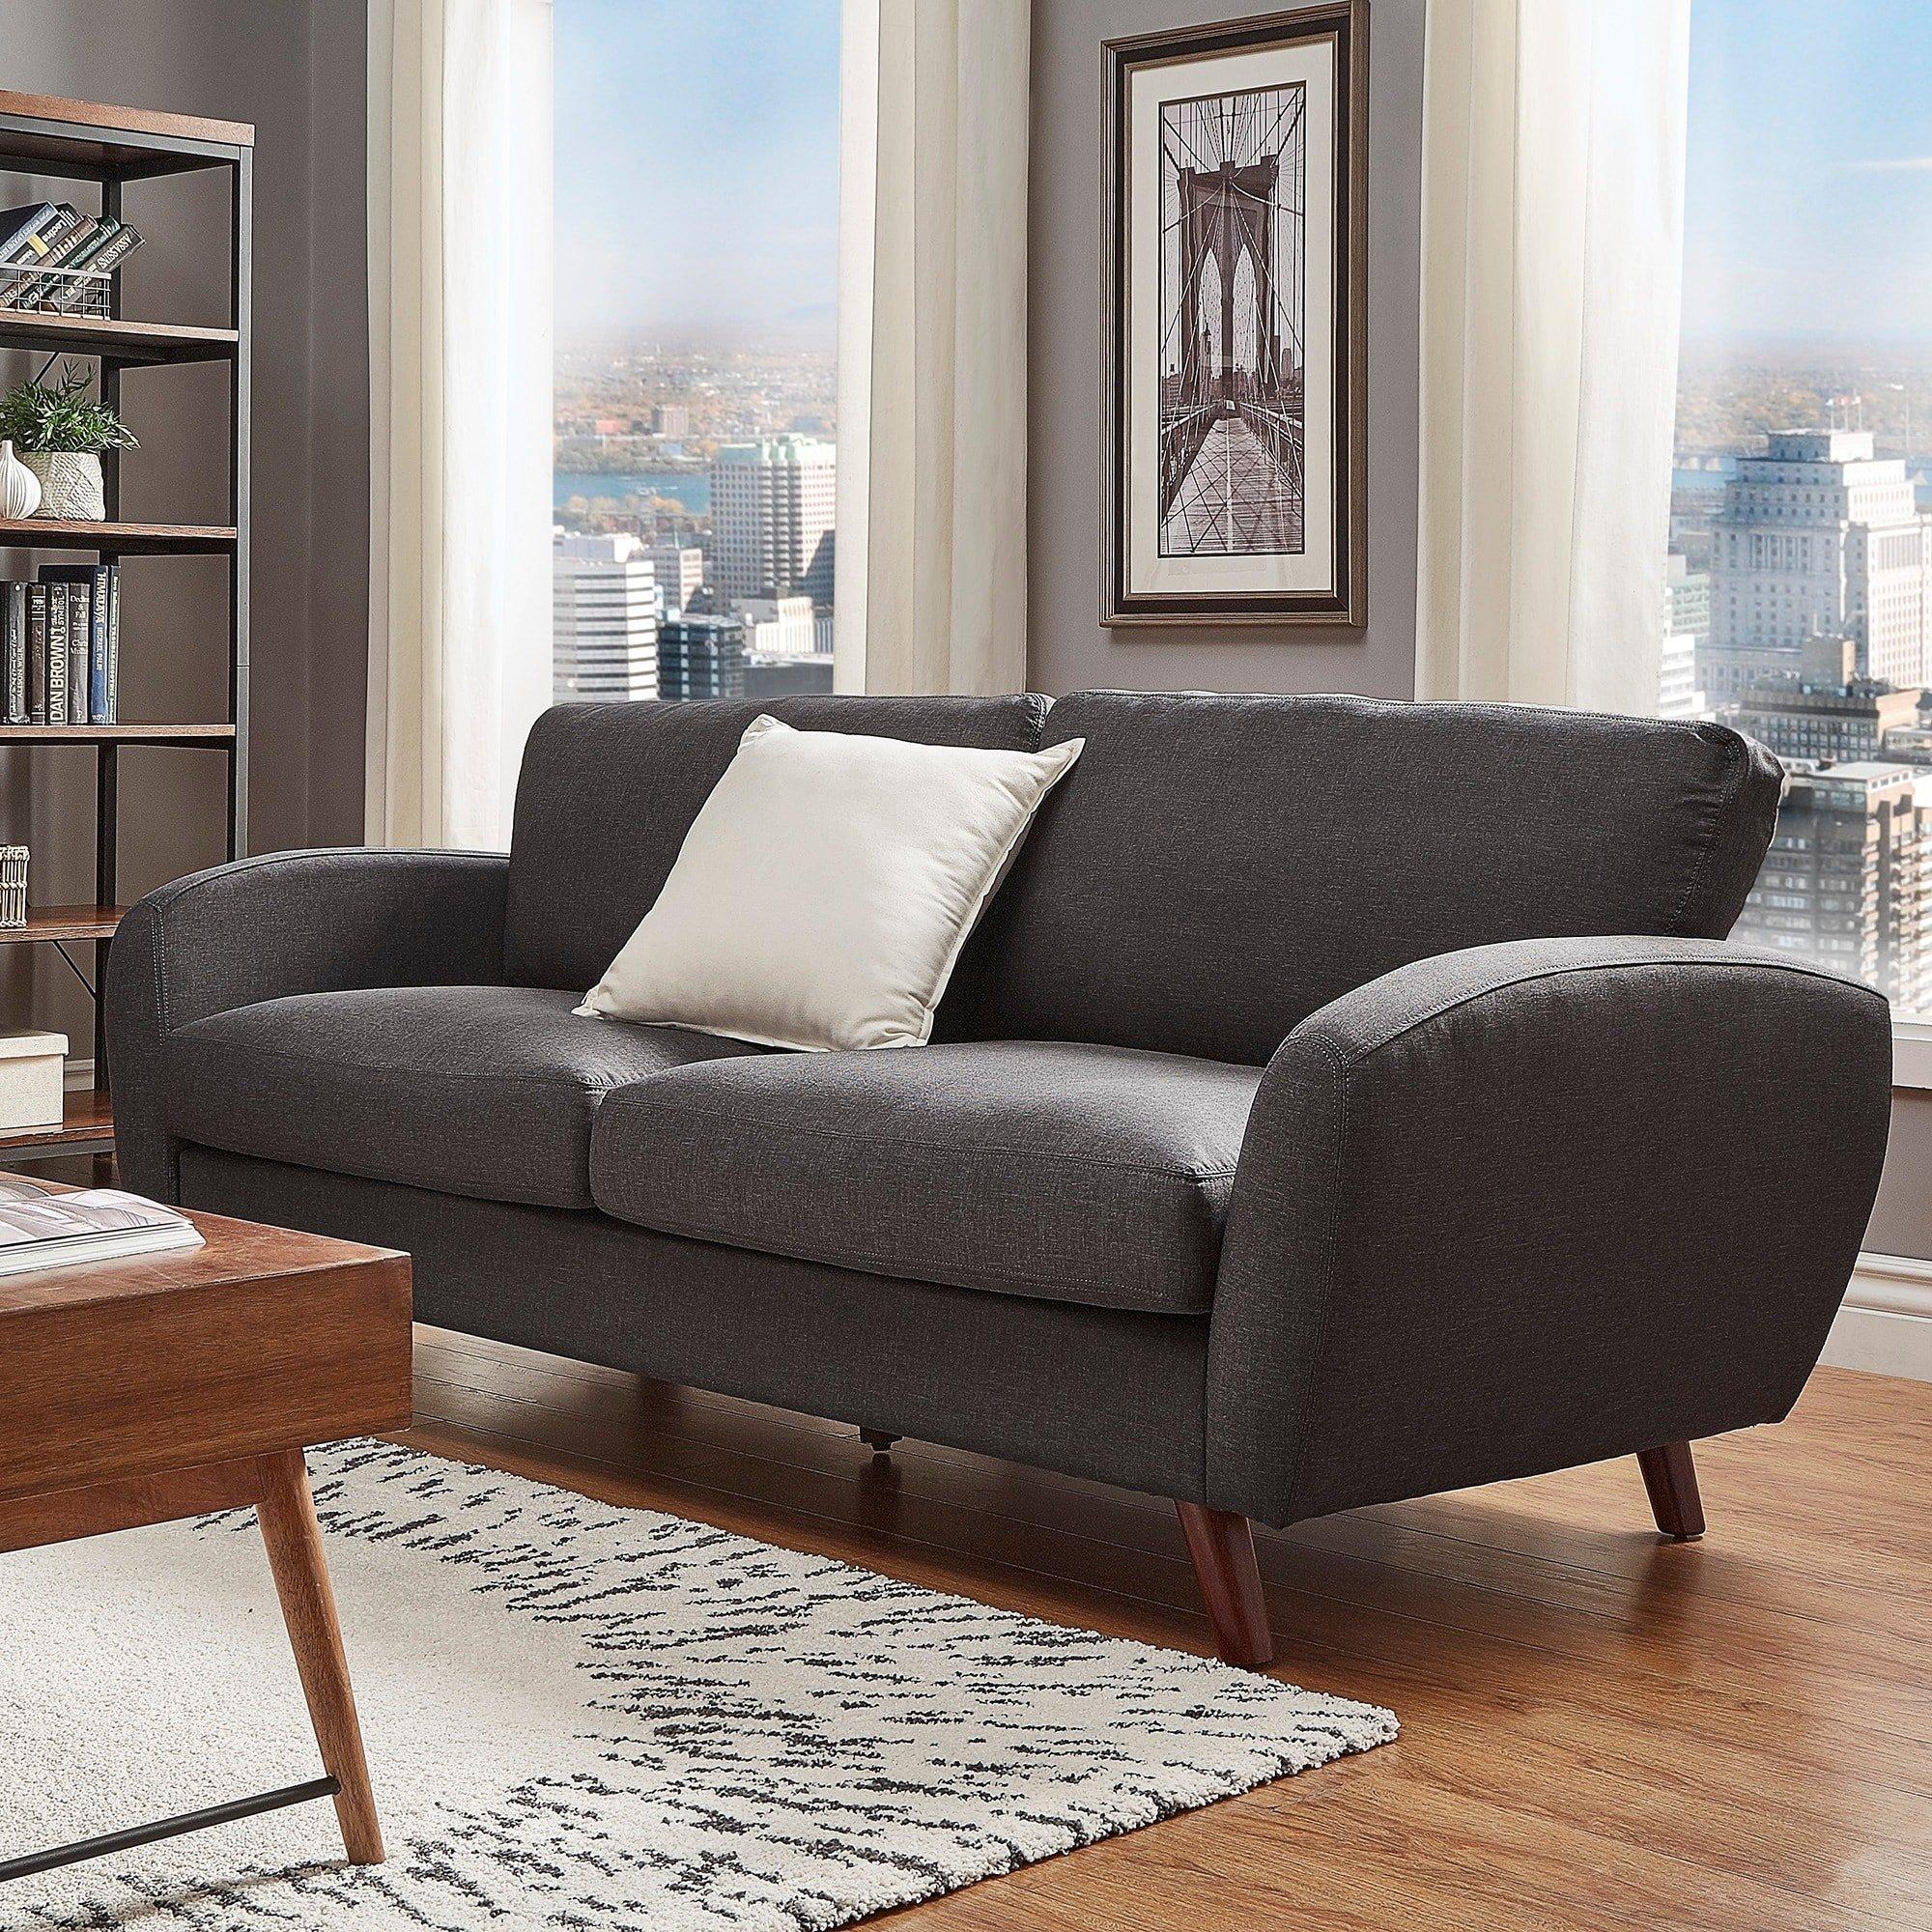 iNSPIRE Q Katryn Linen Fabric Sofa Modern Multi, Black, Grey by iNSPIRE Q